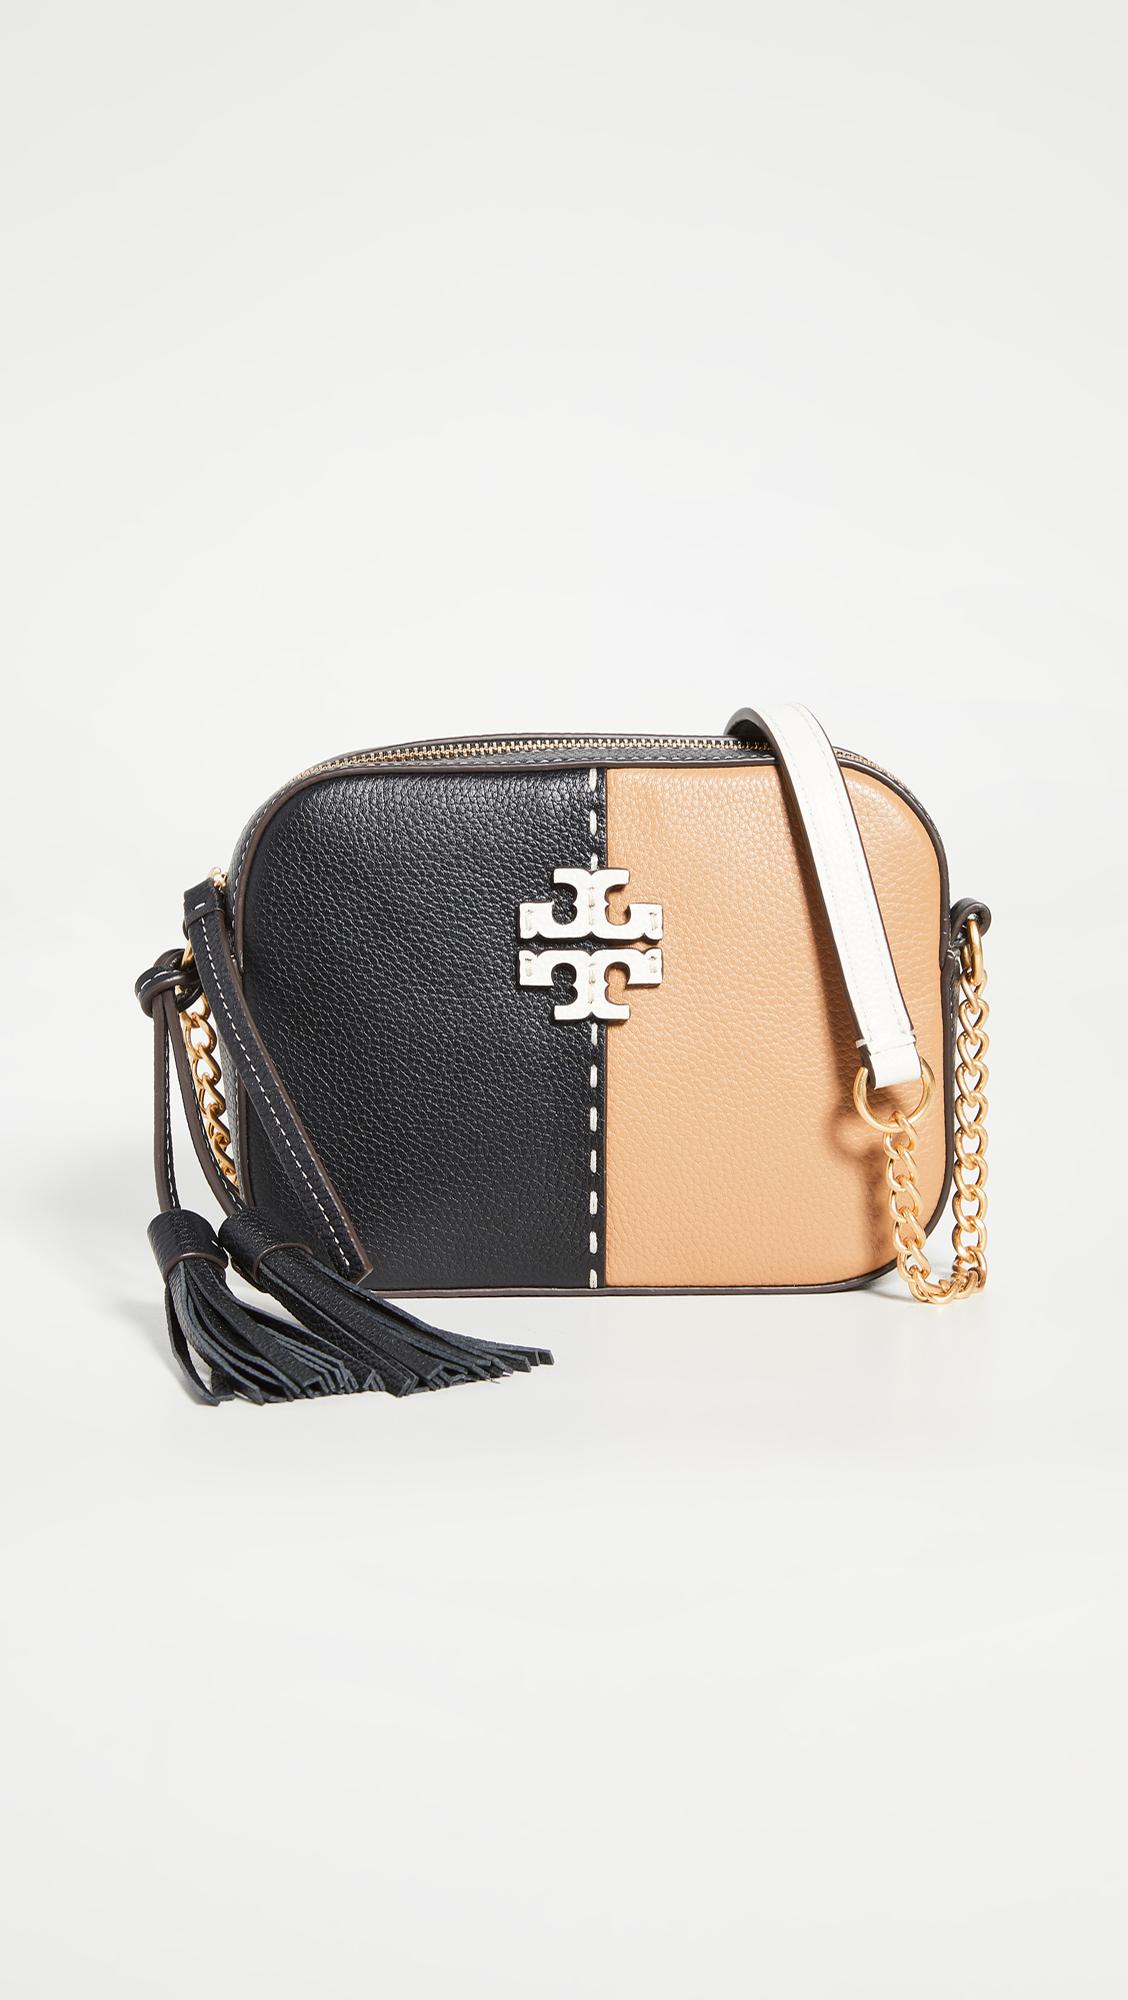 Tory Burch McGraw Colorblock Crossbody Bag